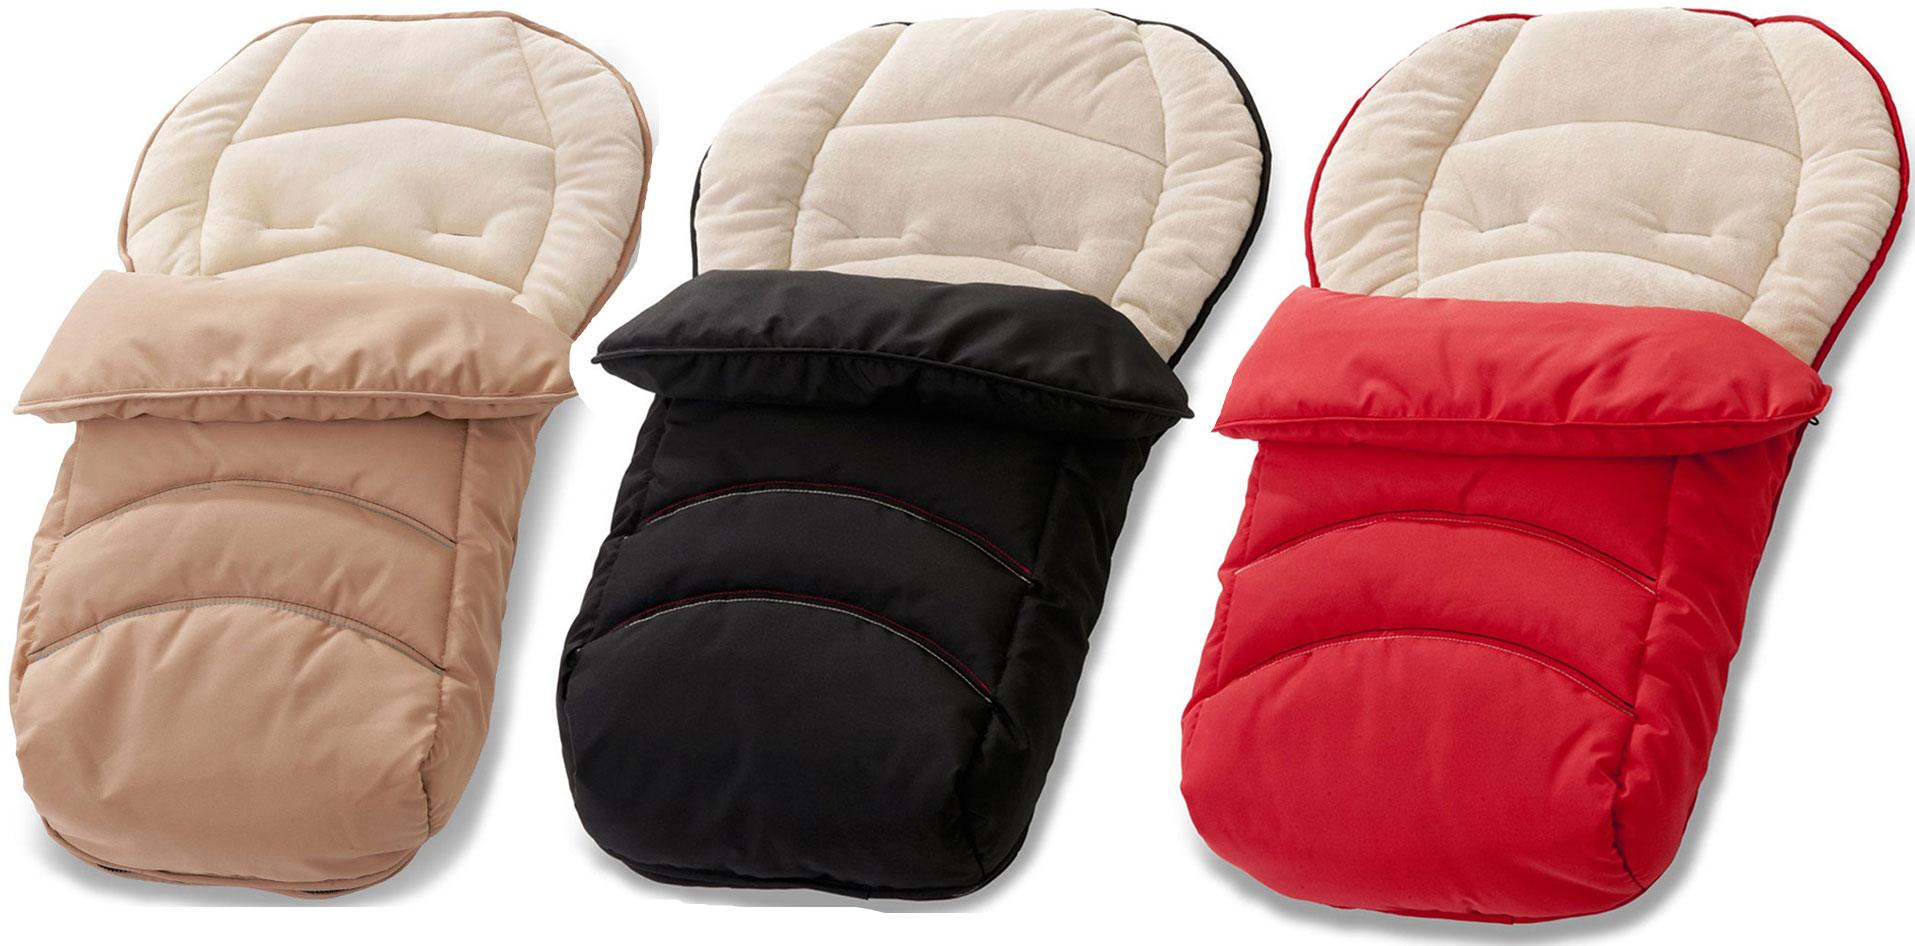 hauck 2 way cosytoe chanceli re r versible accessoire de. Black Bedroom Furniture Sets. Home Design Ideas